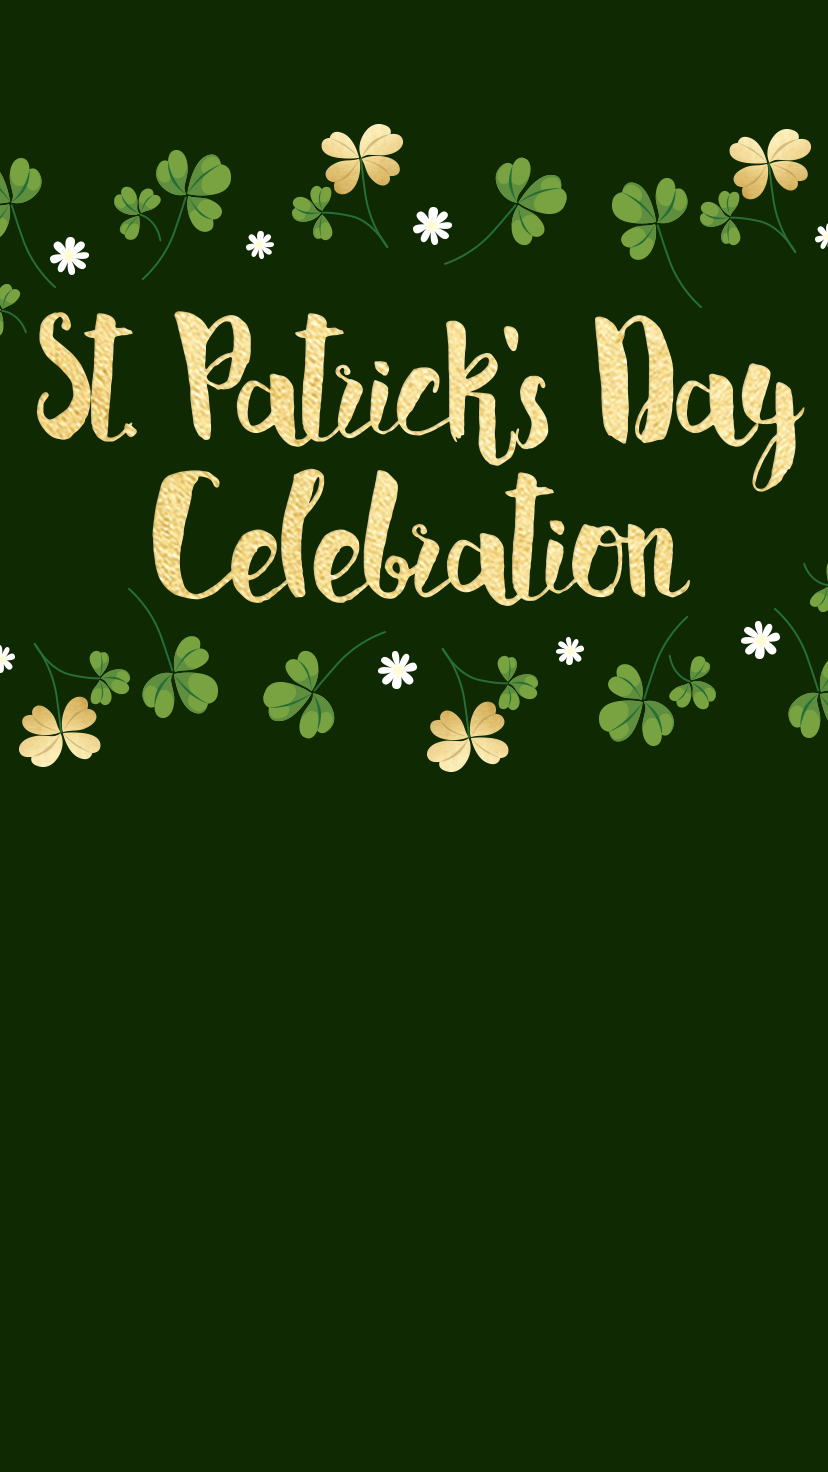 Free St. Patrick's Day Online Invitations | Evite